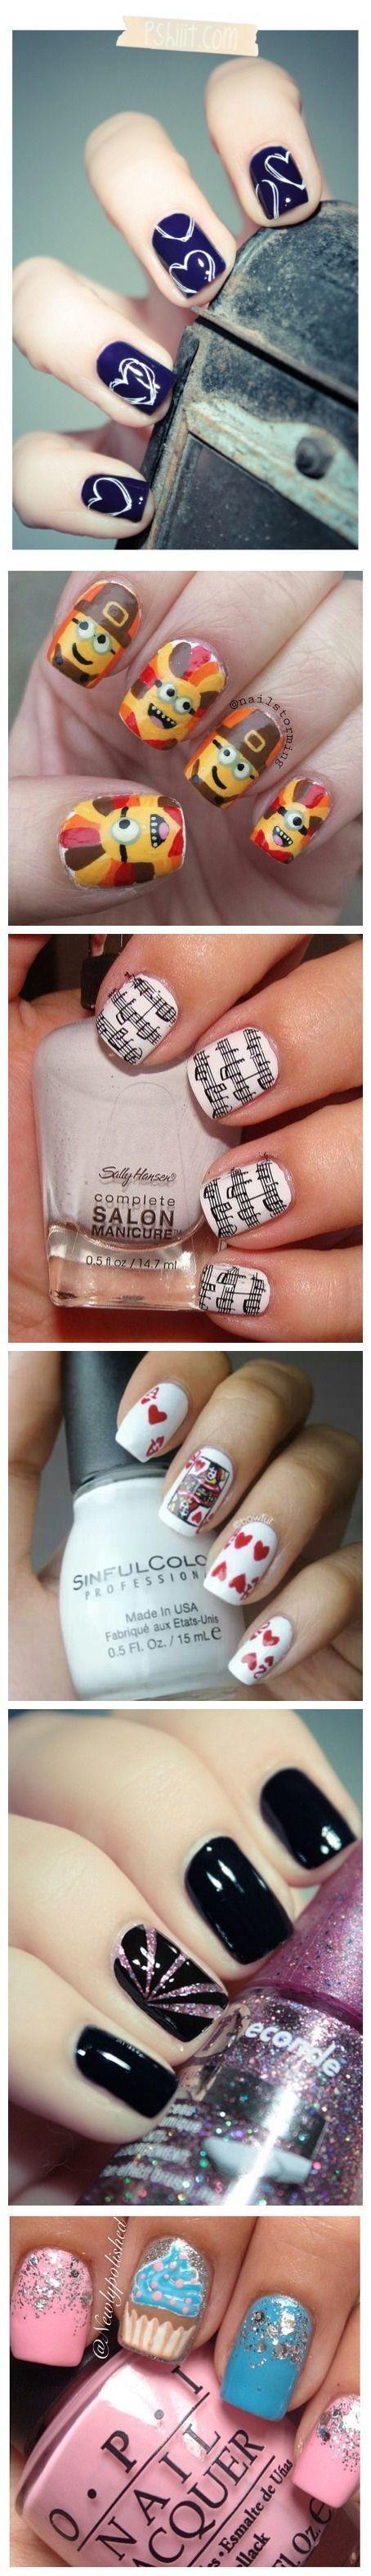 White Doodled Hearts on navy polish nail art Nail Design, Nail Art, Nail Salon, Irvine, Newport Beach